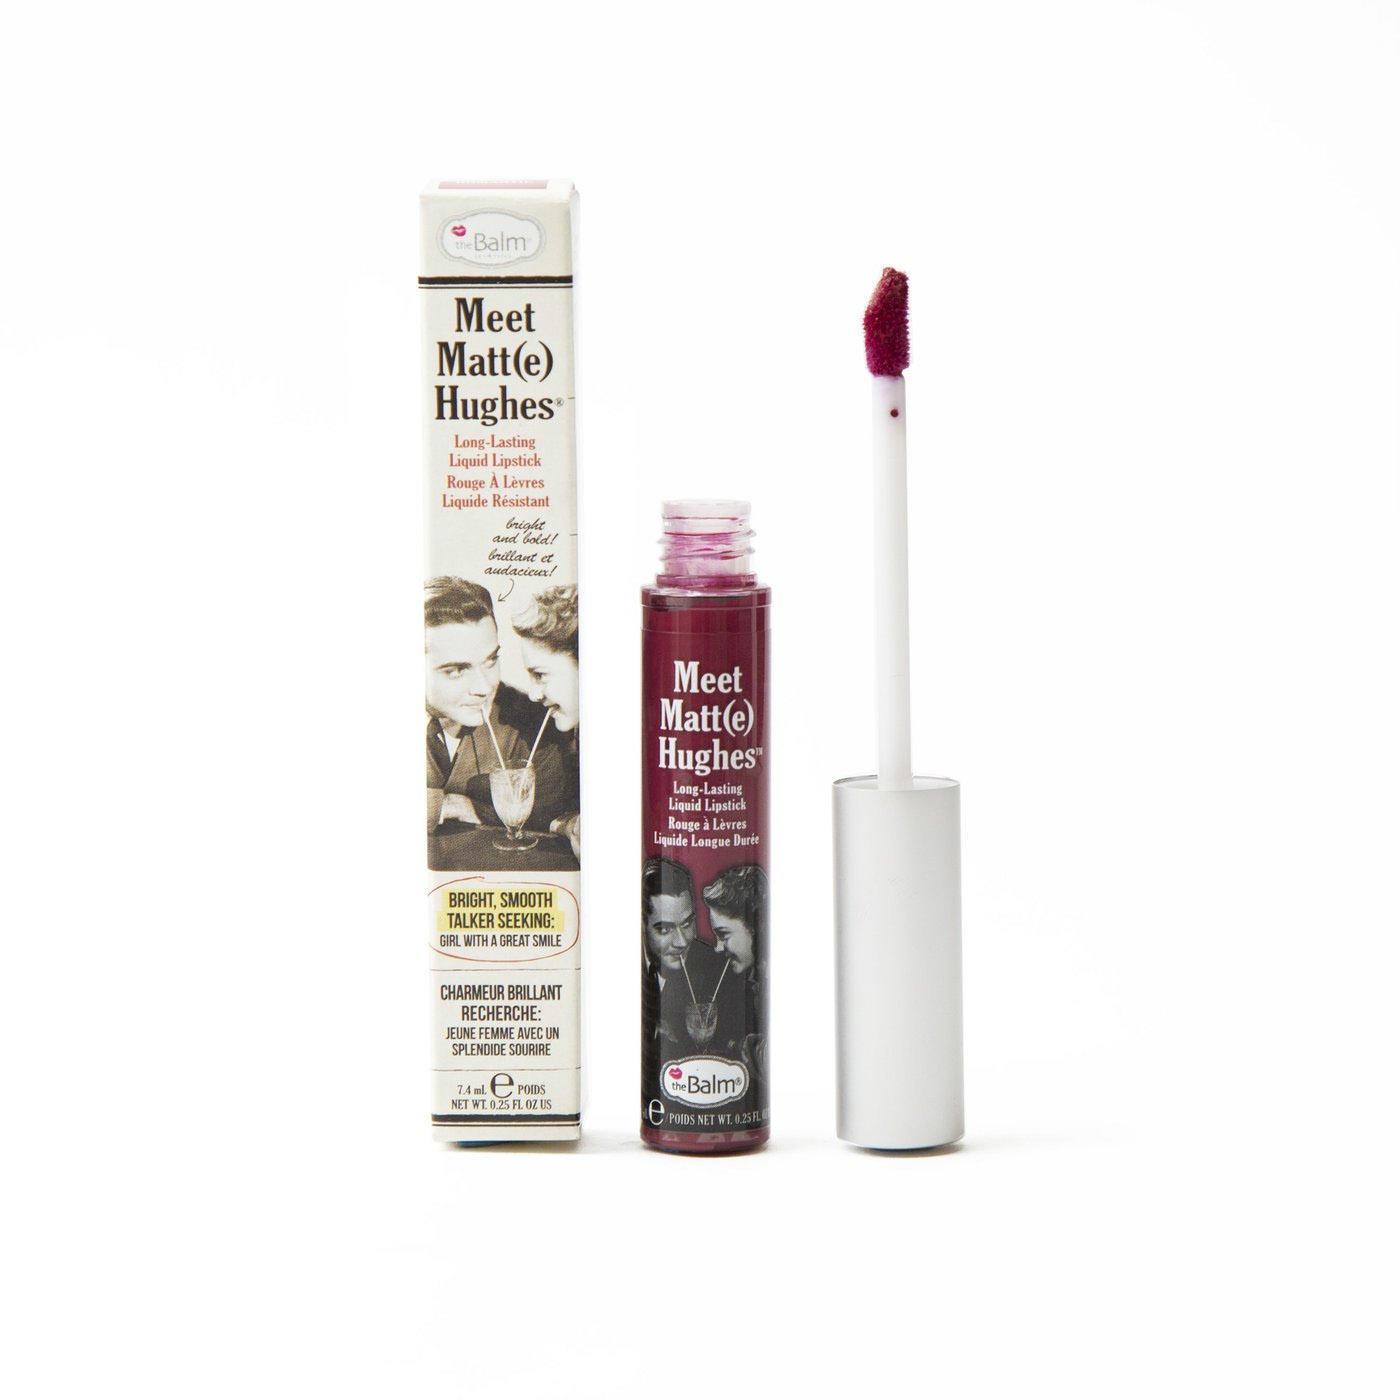 The Balm Long-Lasting Liquid Lipstick Meet Matt(e) Hughes Romantic